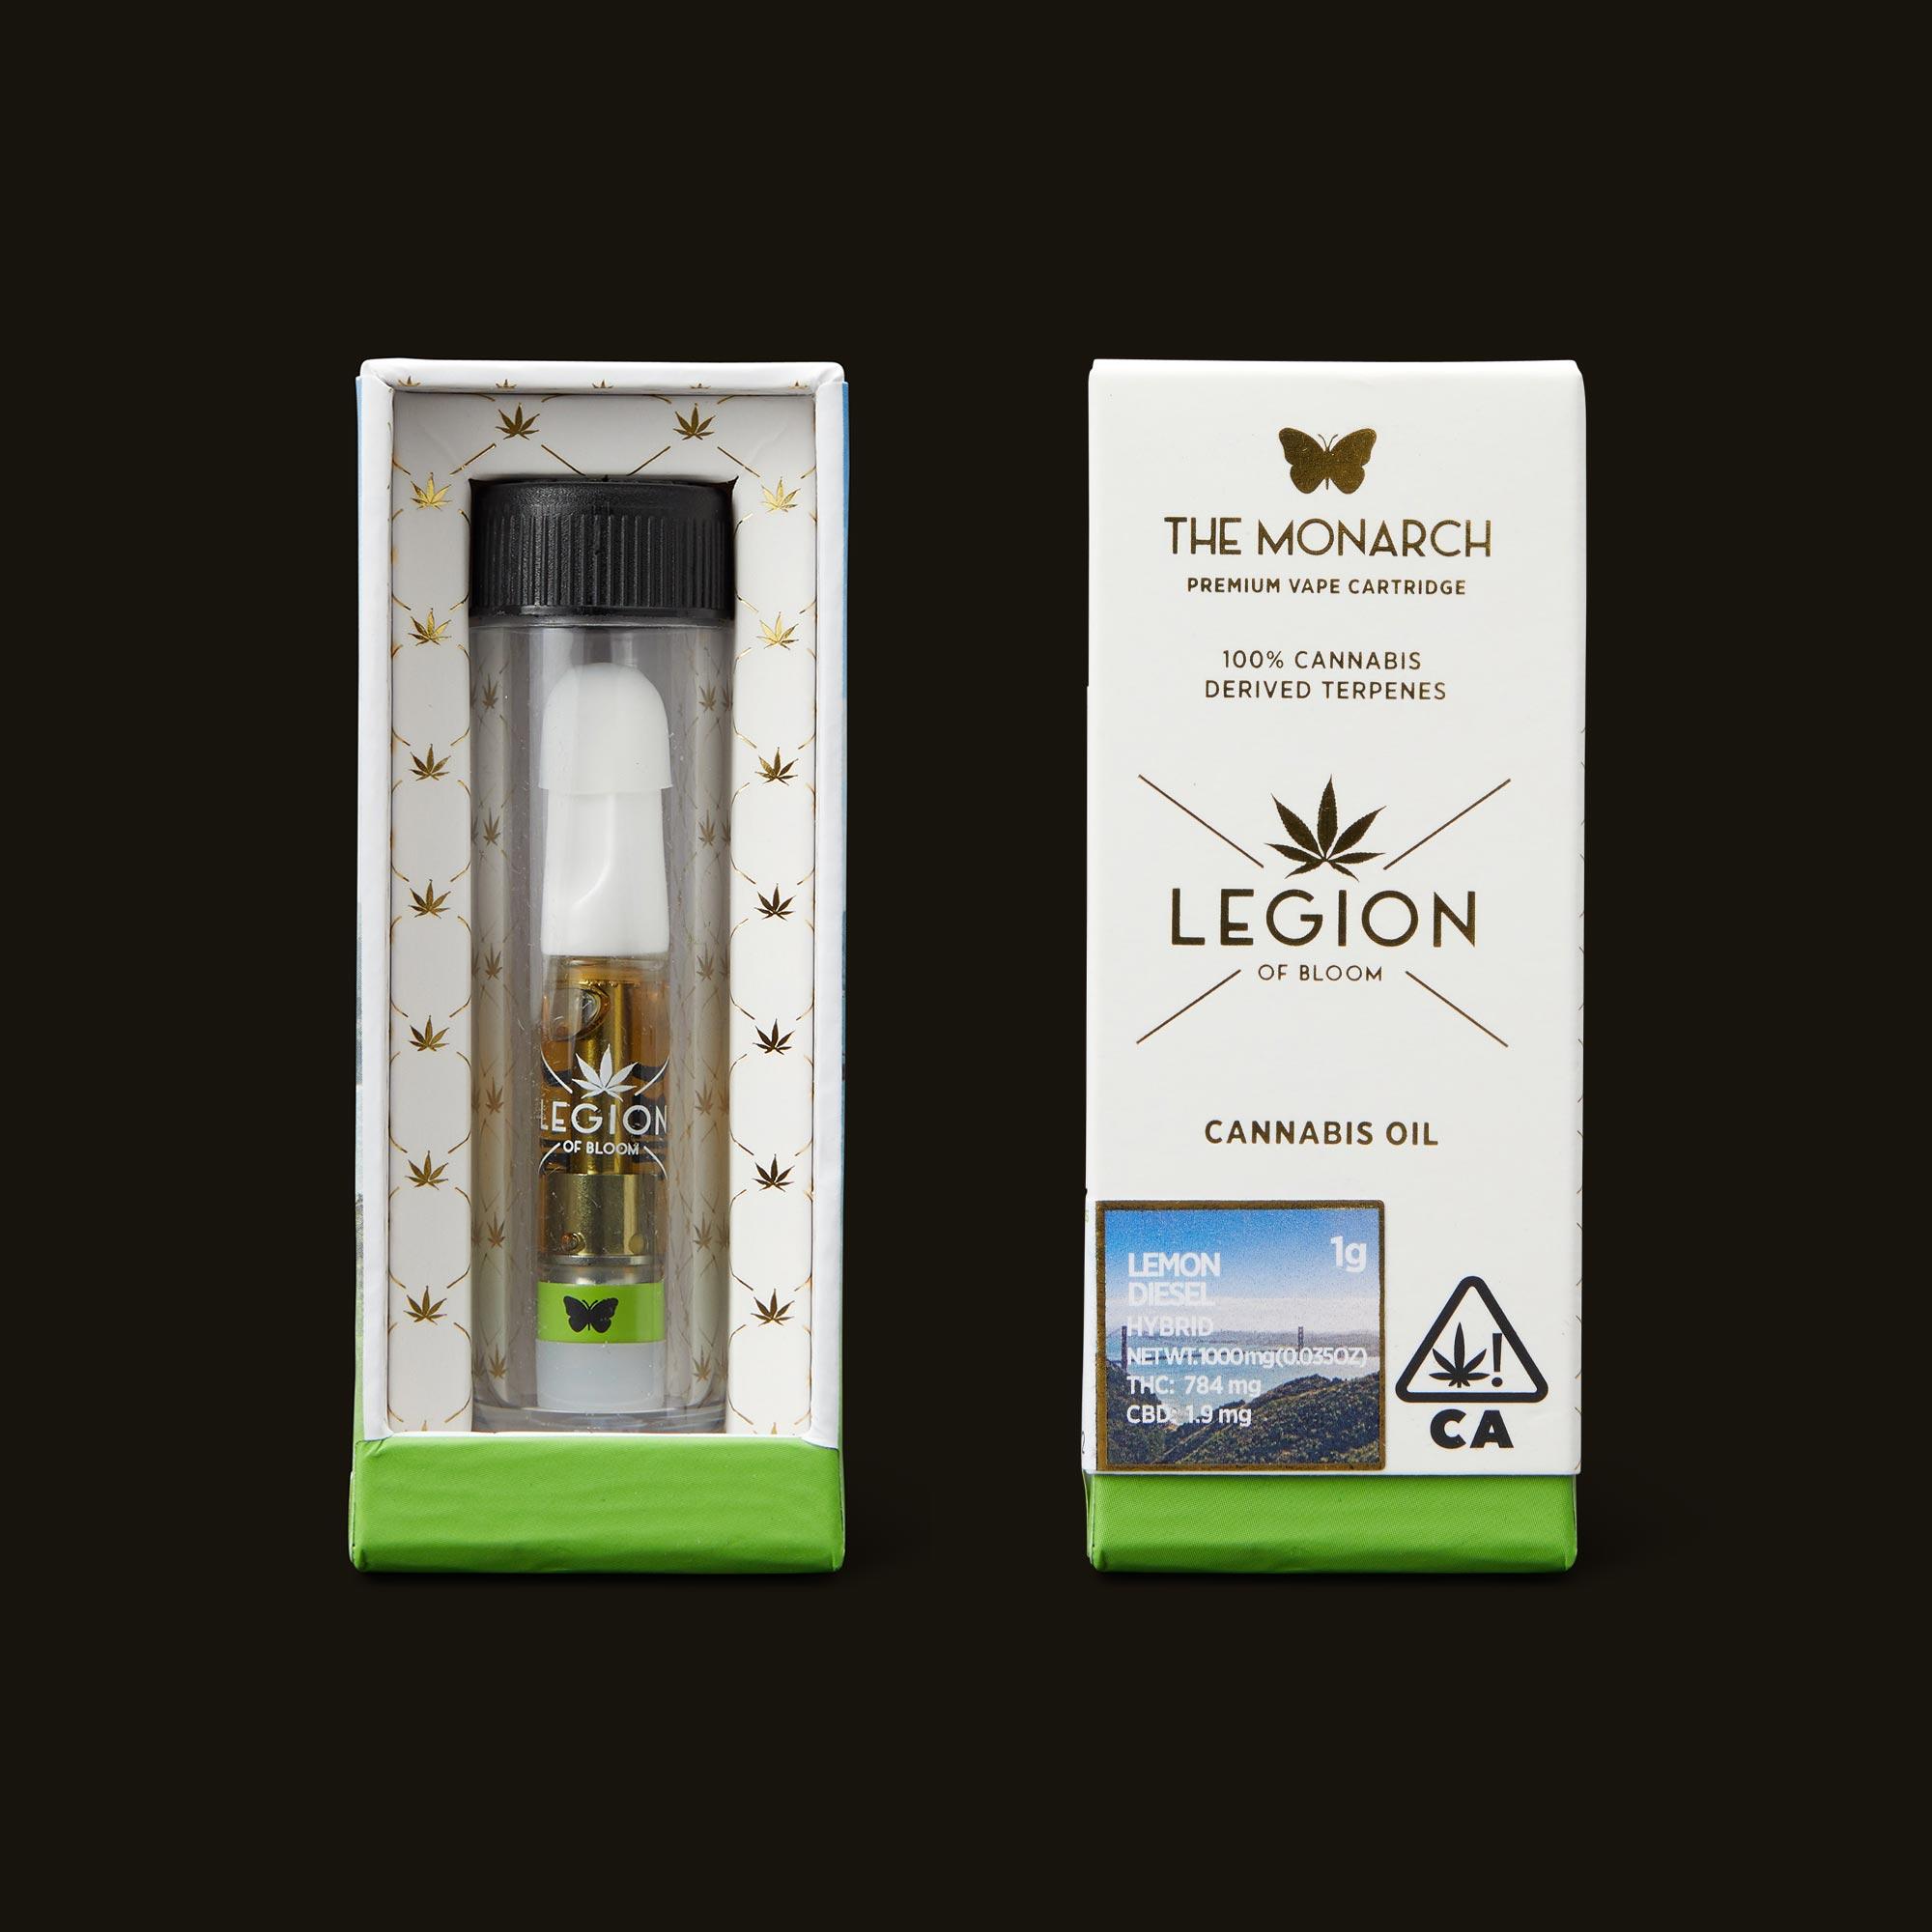 Legion of Bloom Lemon Diesel Monarch Open Packaging